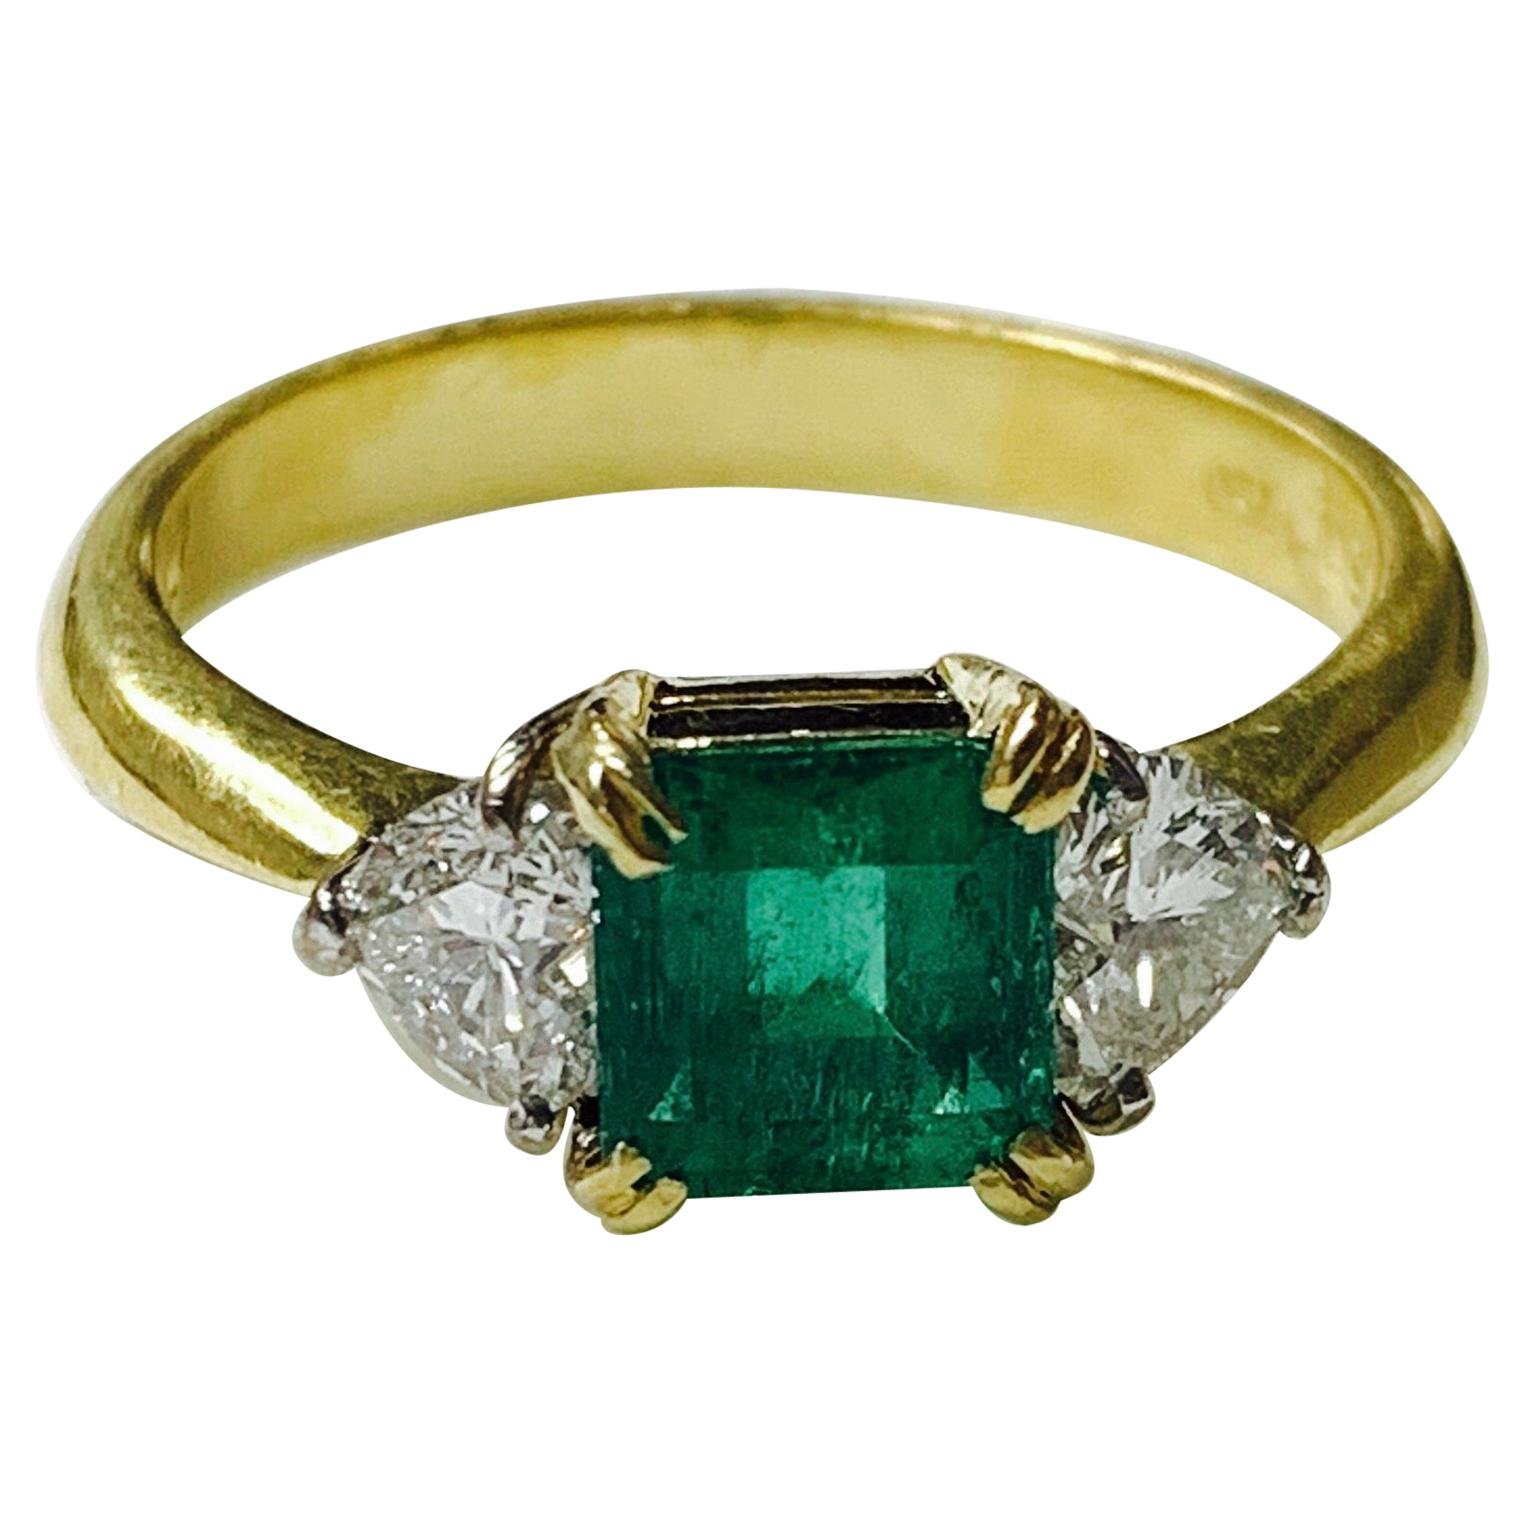 Columbian Emerald and Diamond Engagement Ring in 18 Karat White Gold